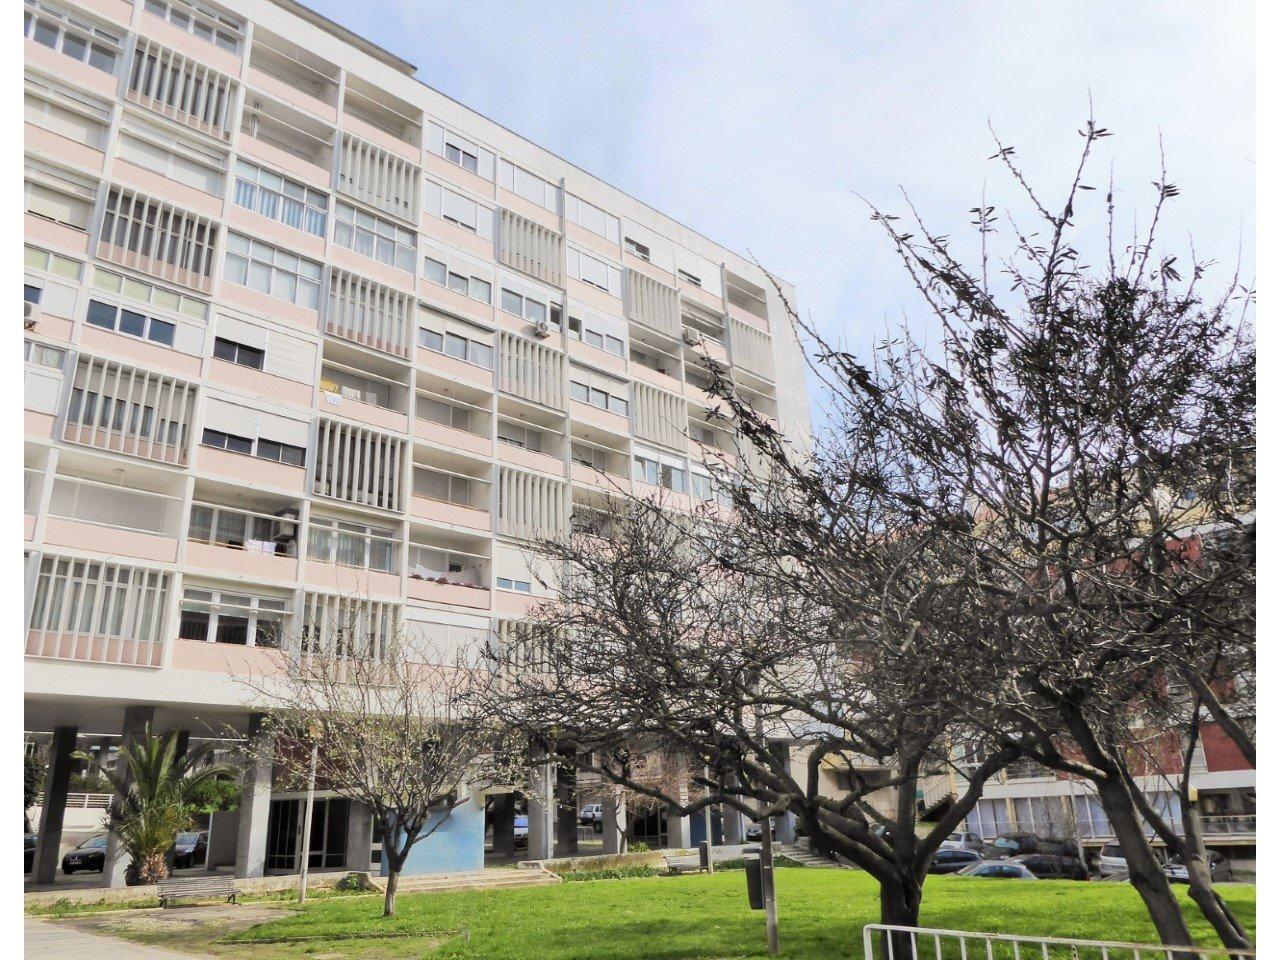 4 Bedroom Apartment Lisbon, Lisbon Ref: AMA13869